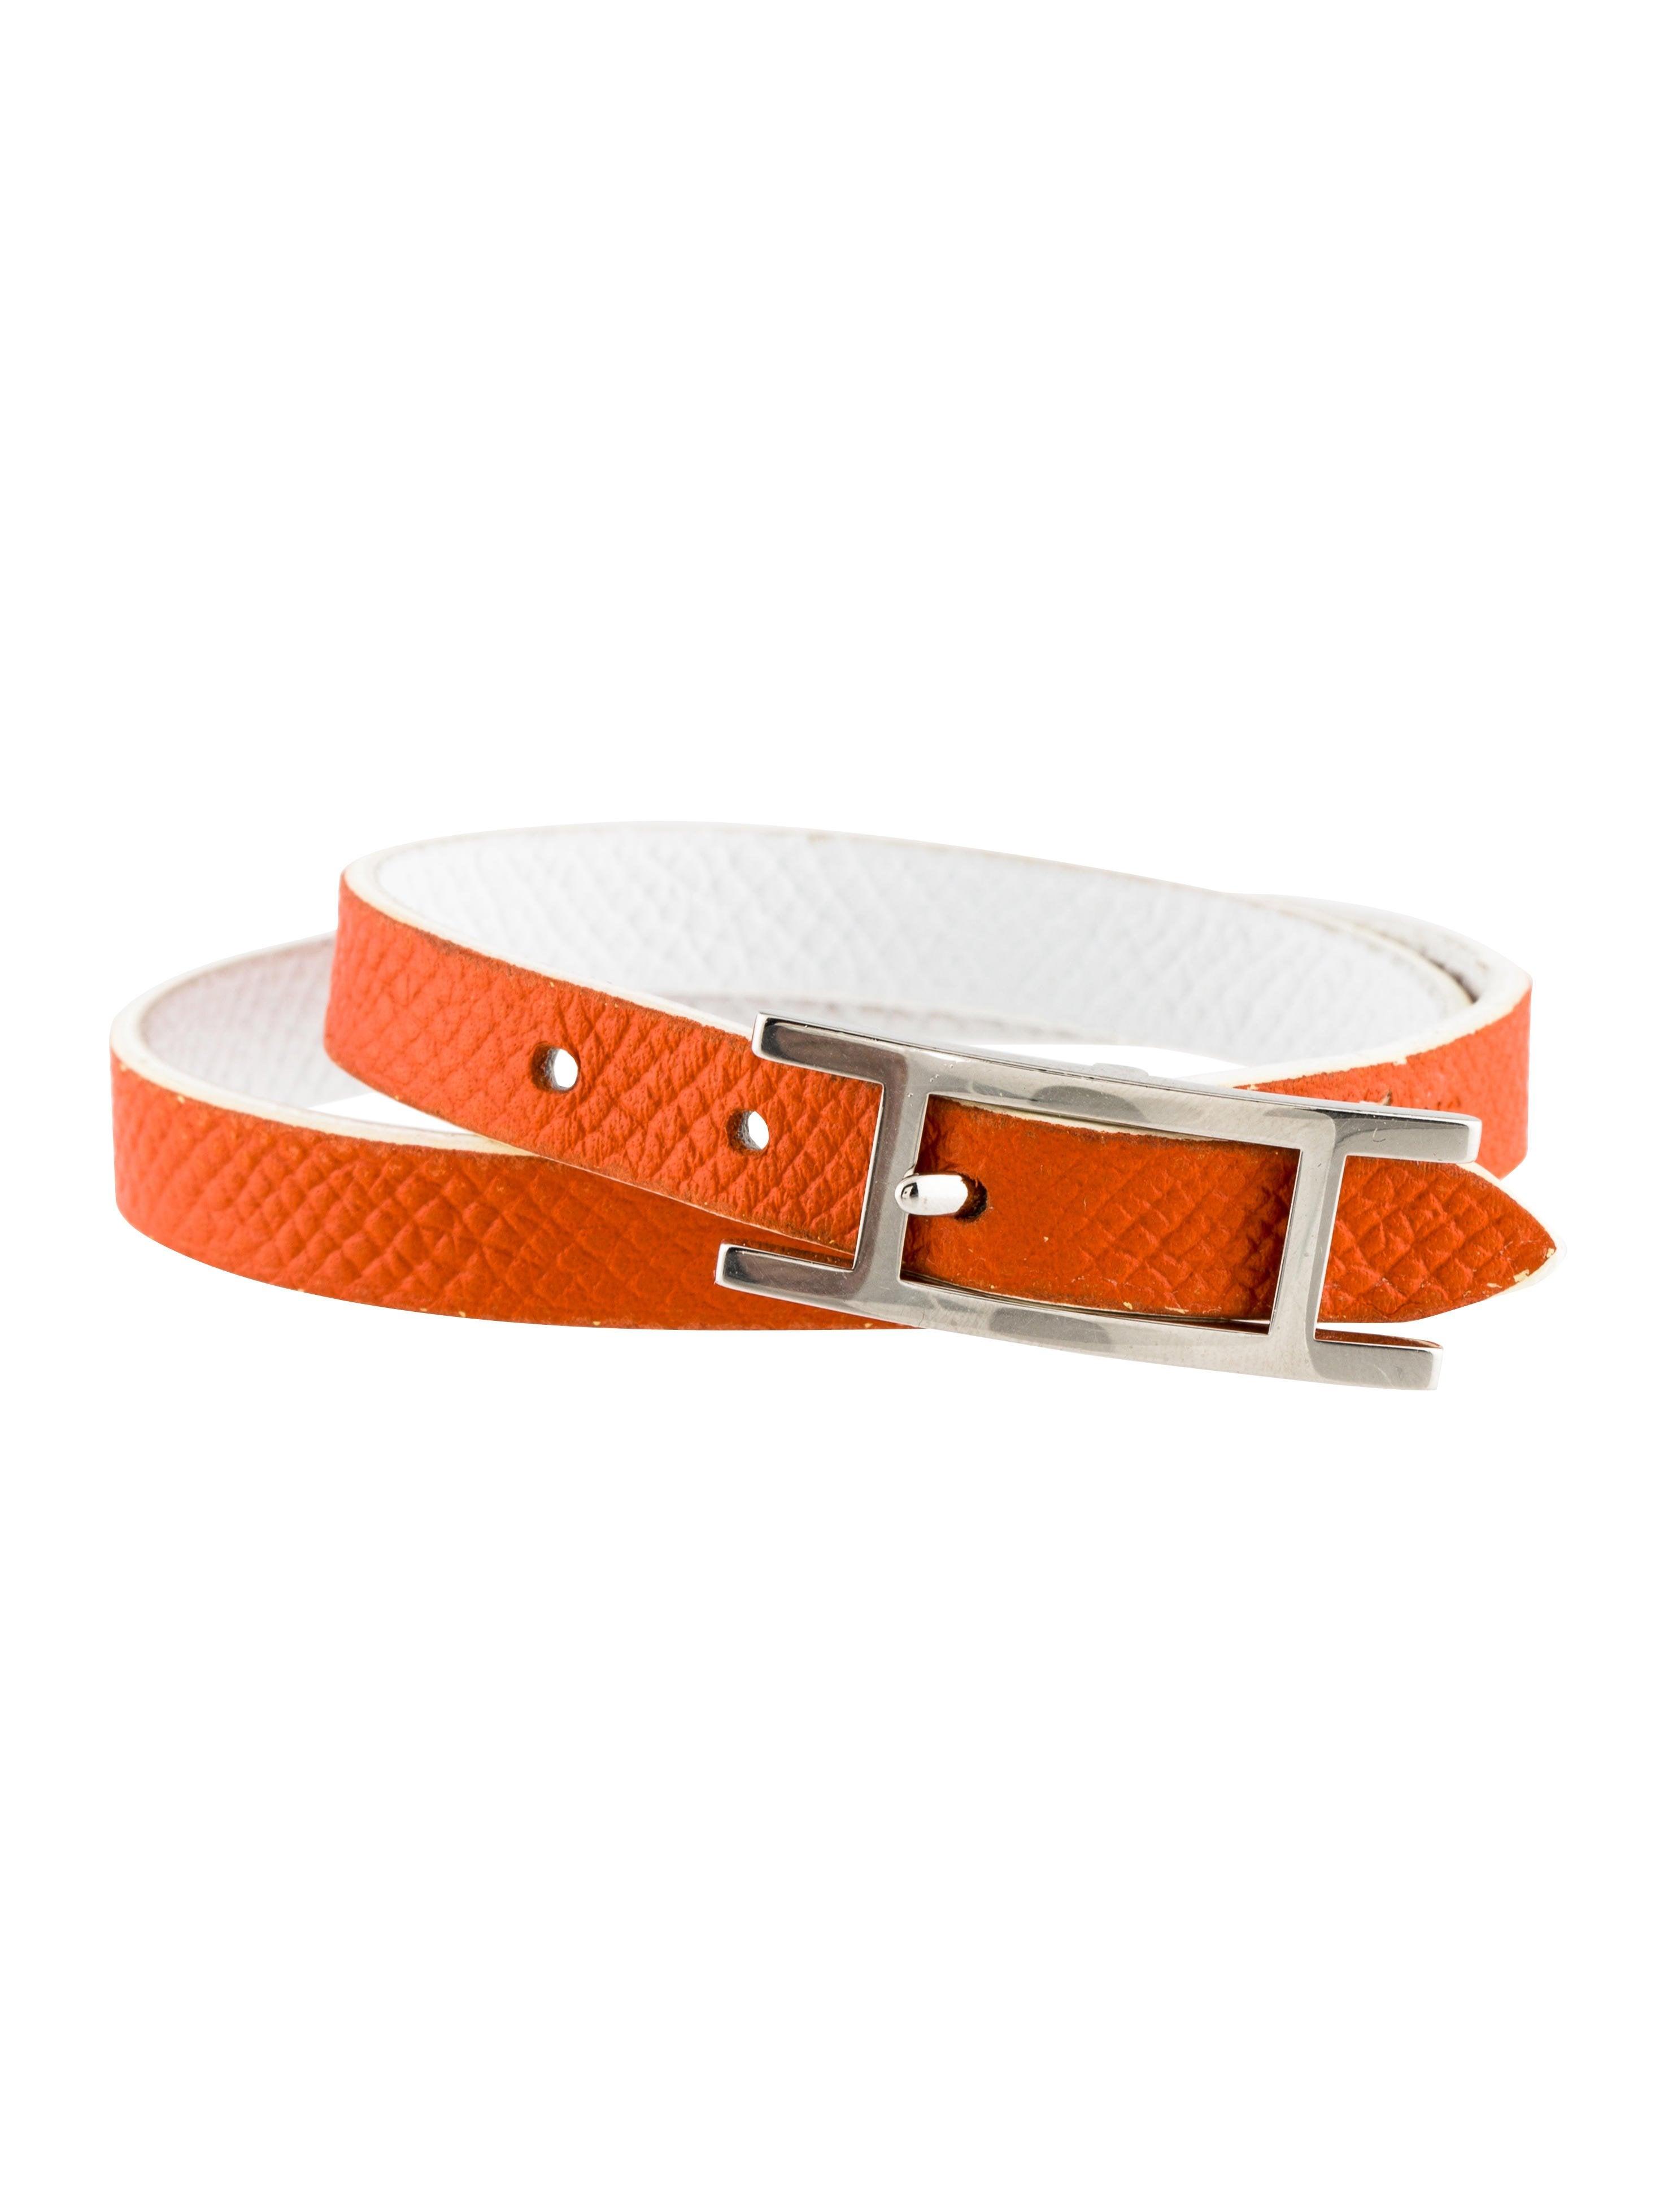 Hermes Behapi Double Tour Bracelet Price